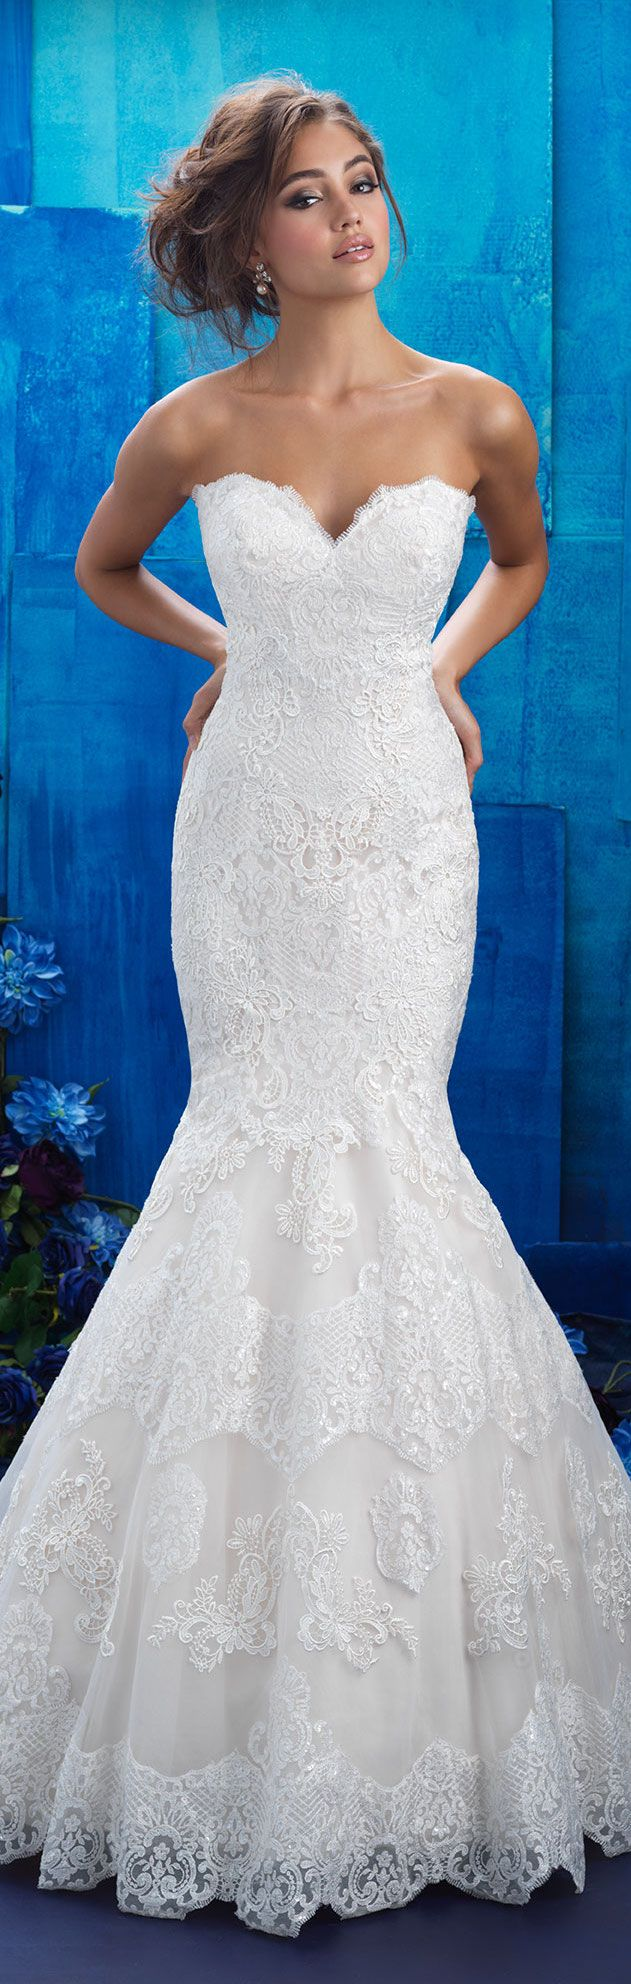 Lace wedding dress under 200 november 2018  best Dream wedding images on Pinterest  Hairstyle ideas Wedding